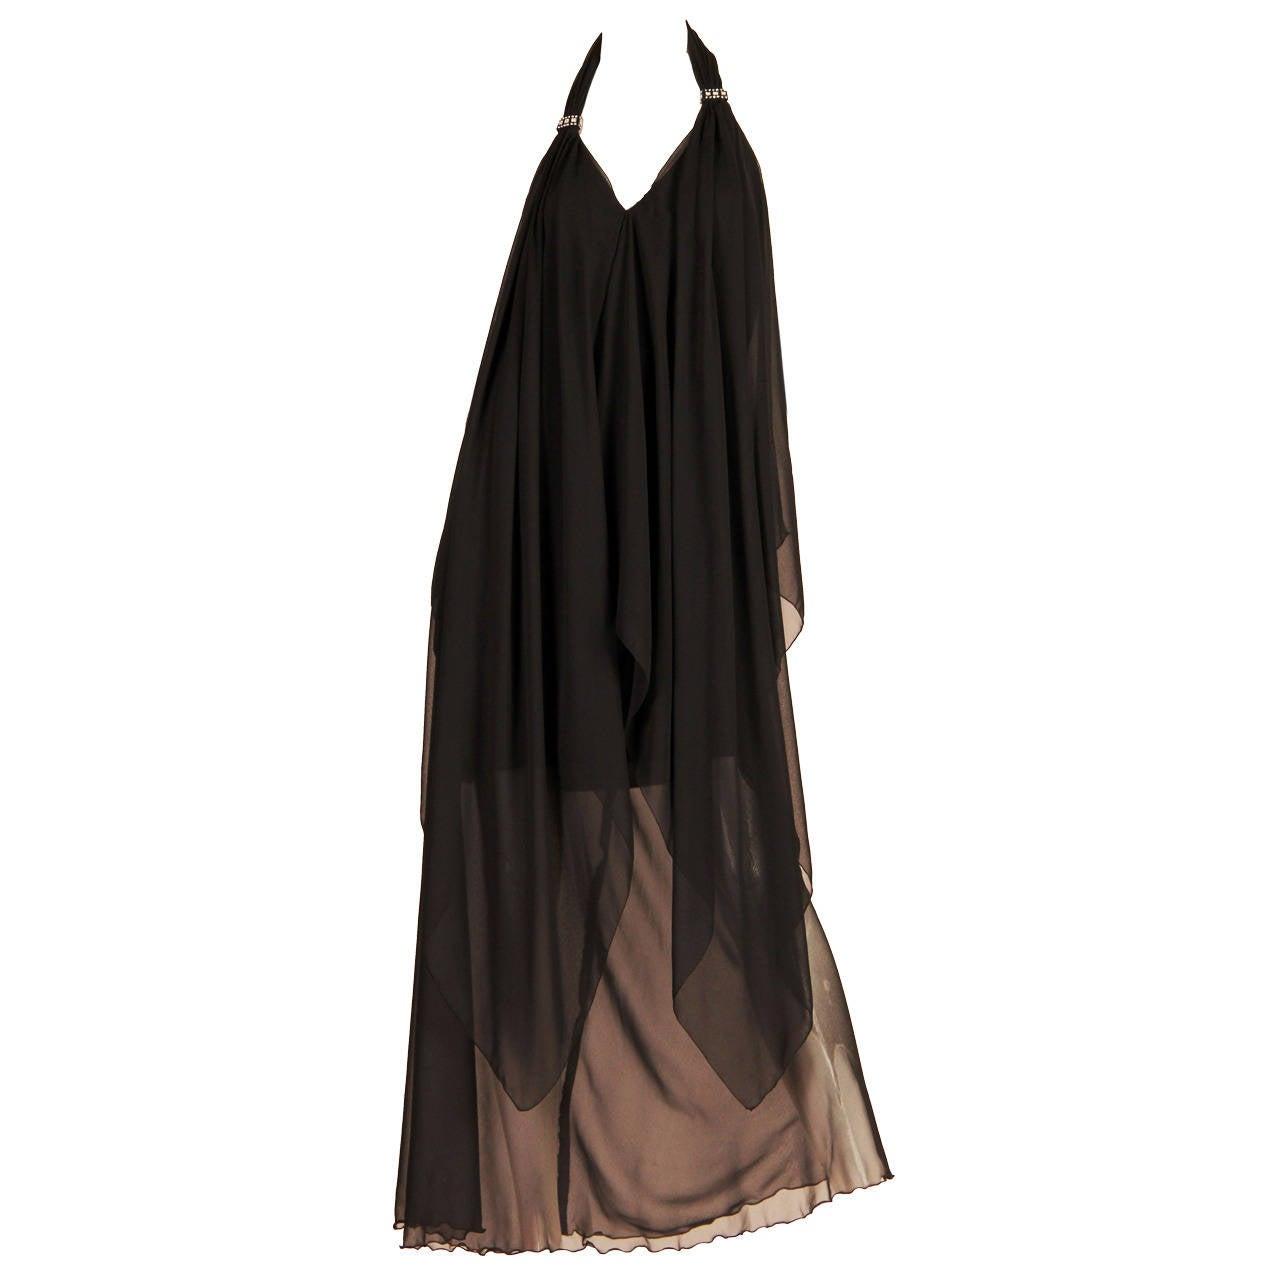 Pierre Cardin Haute Couture Chiffon Evening Dress